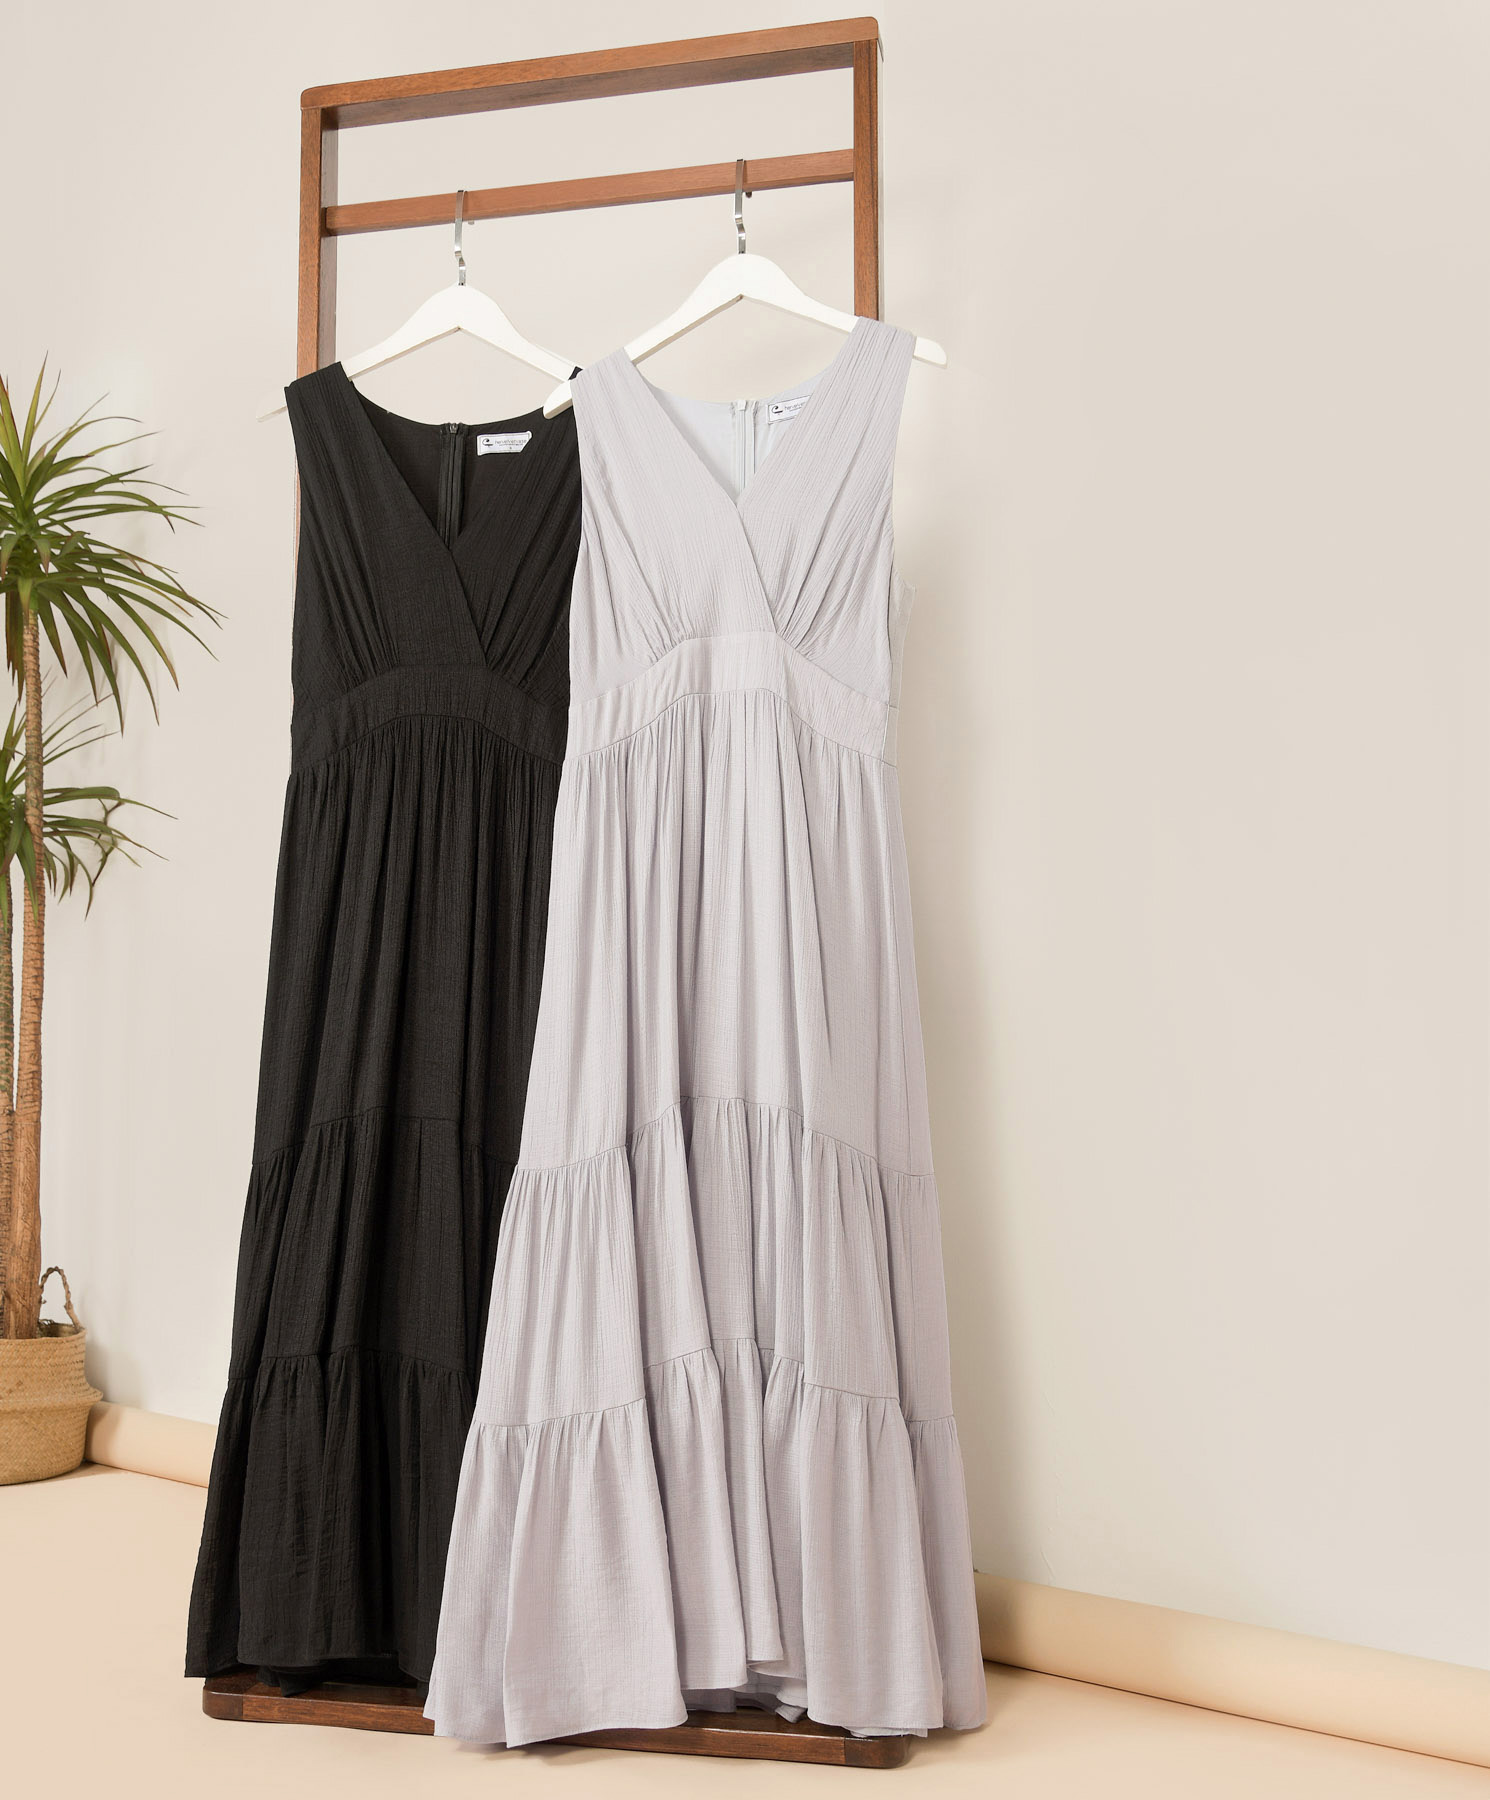 risa-surplice-tiered-maxi-dress-bundle-of-2